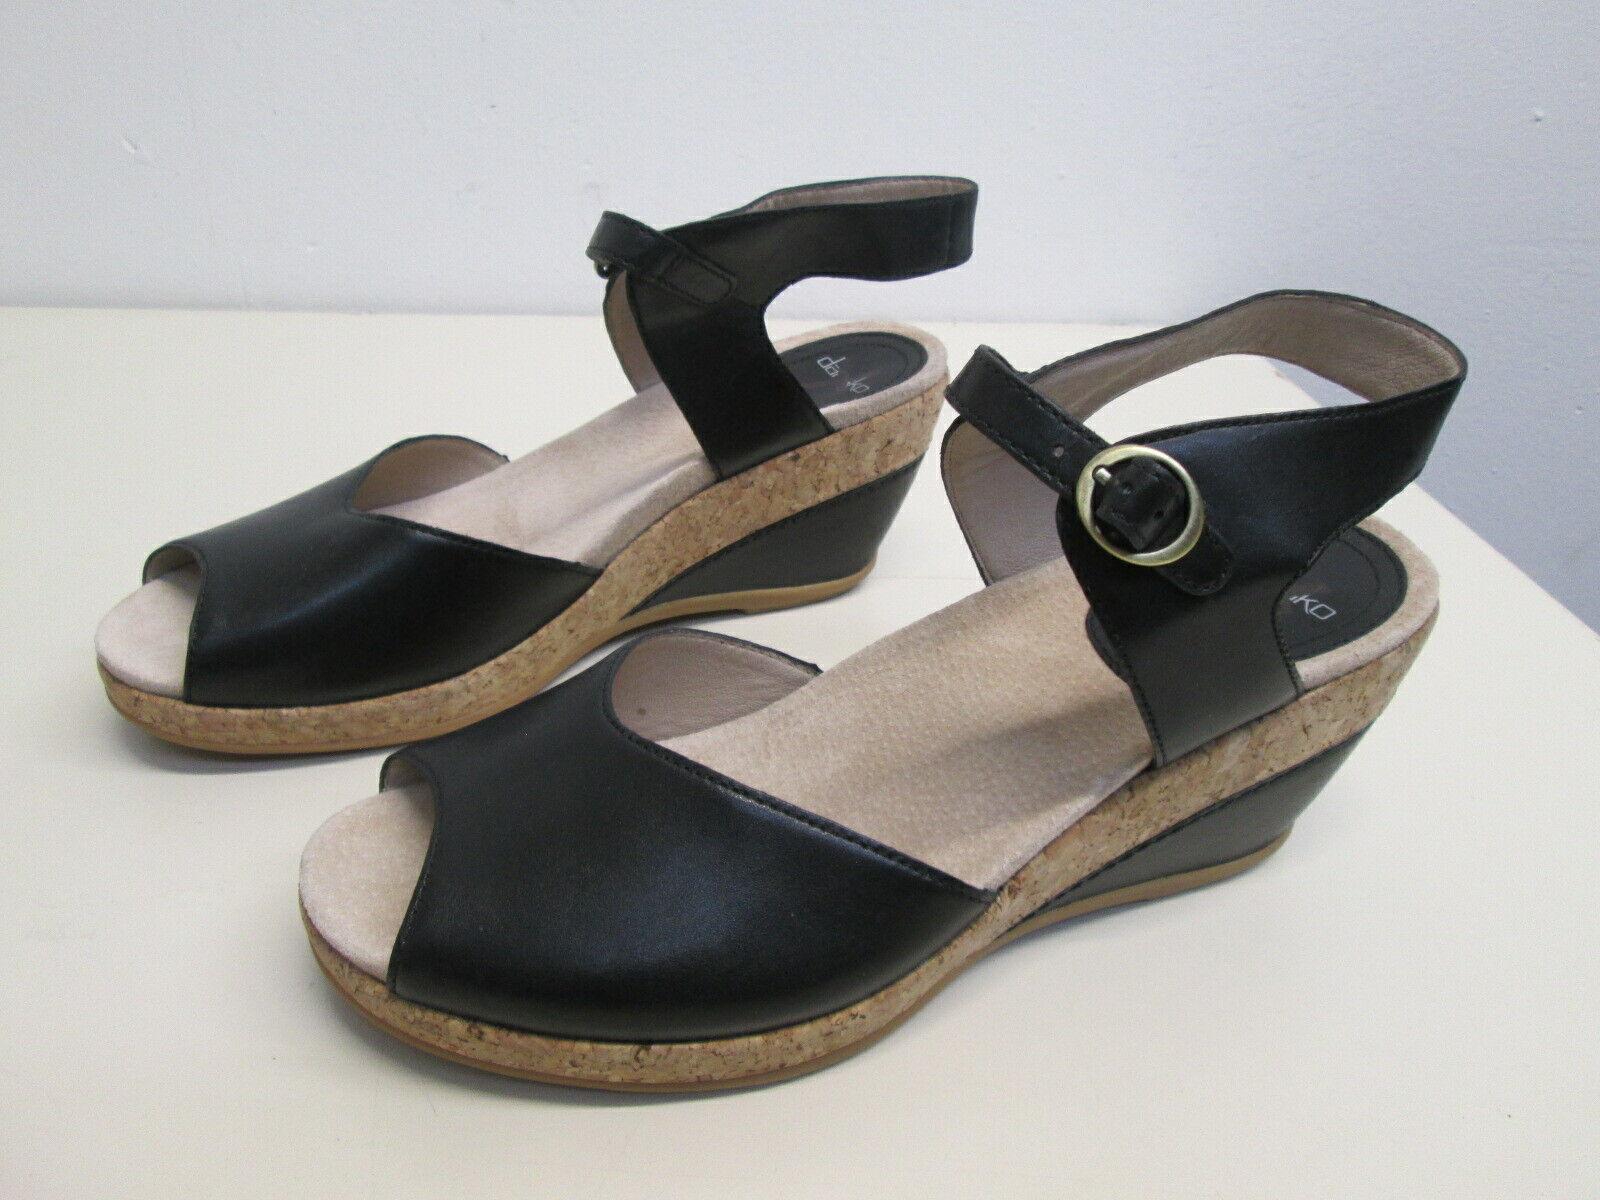 New Dansko Charlotte Black Leather Sandal Wedge open toe hee